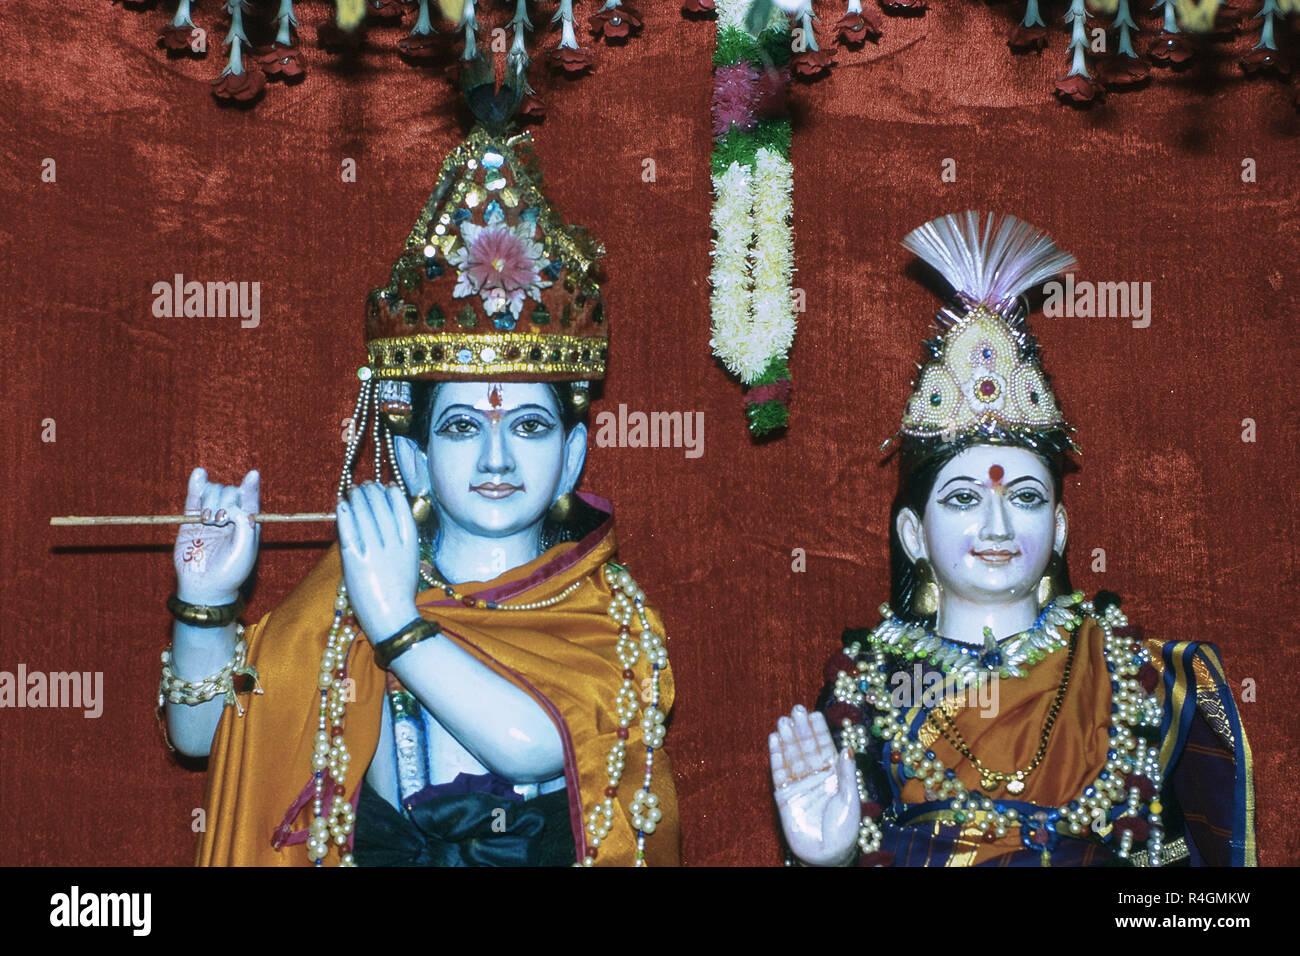 Lord Krishna Idol Stock Photos & Lord Krishna Idol Stock